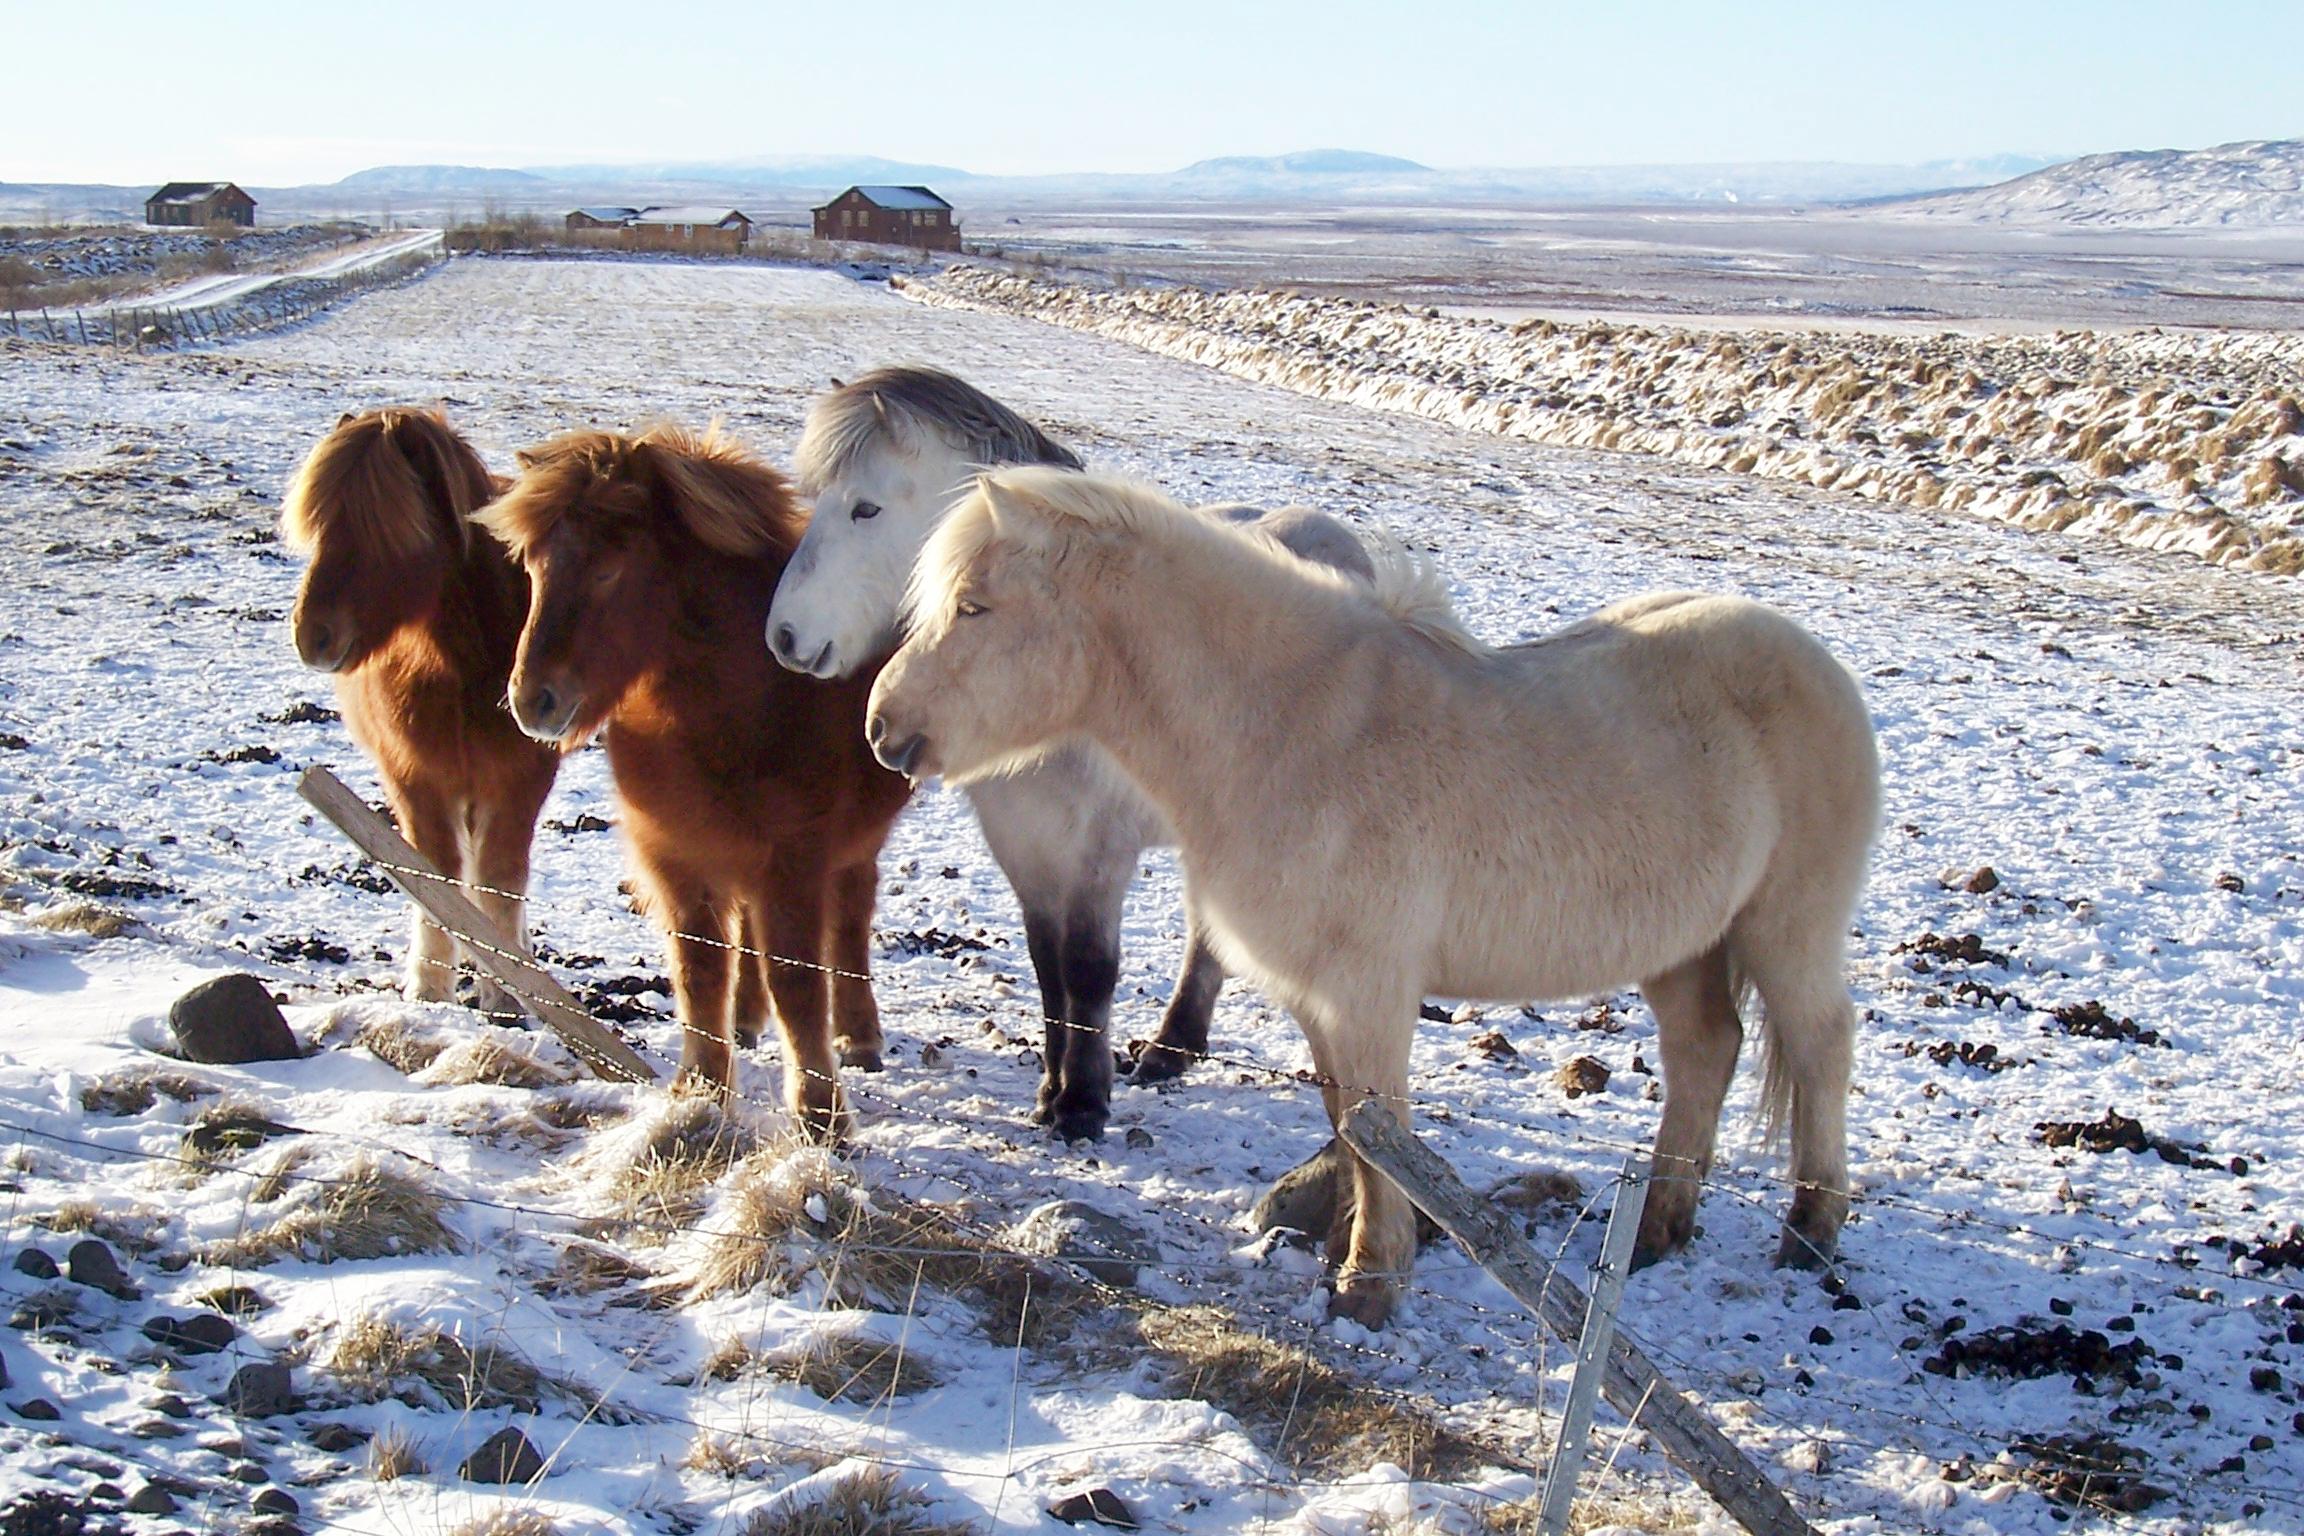 Island, Suedisland,  Winter, Schnee, Islandpferde, Pferde, Pferdeherde